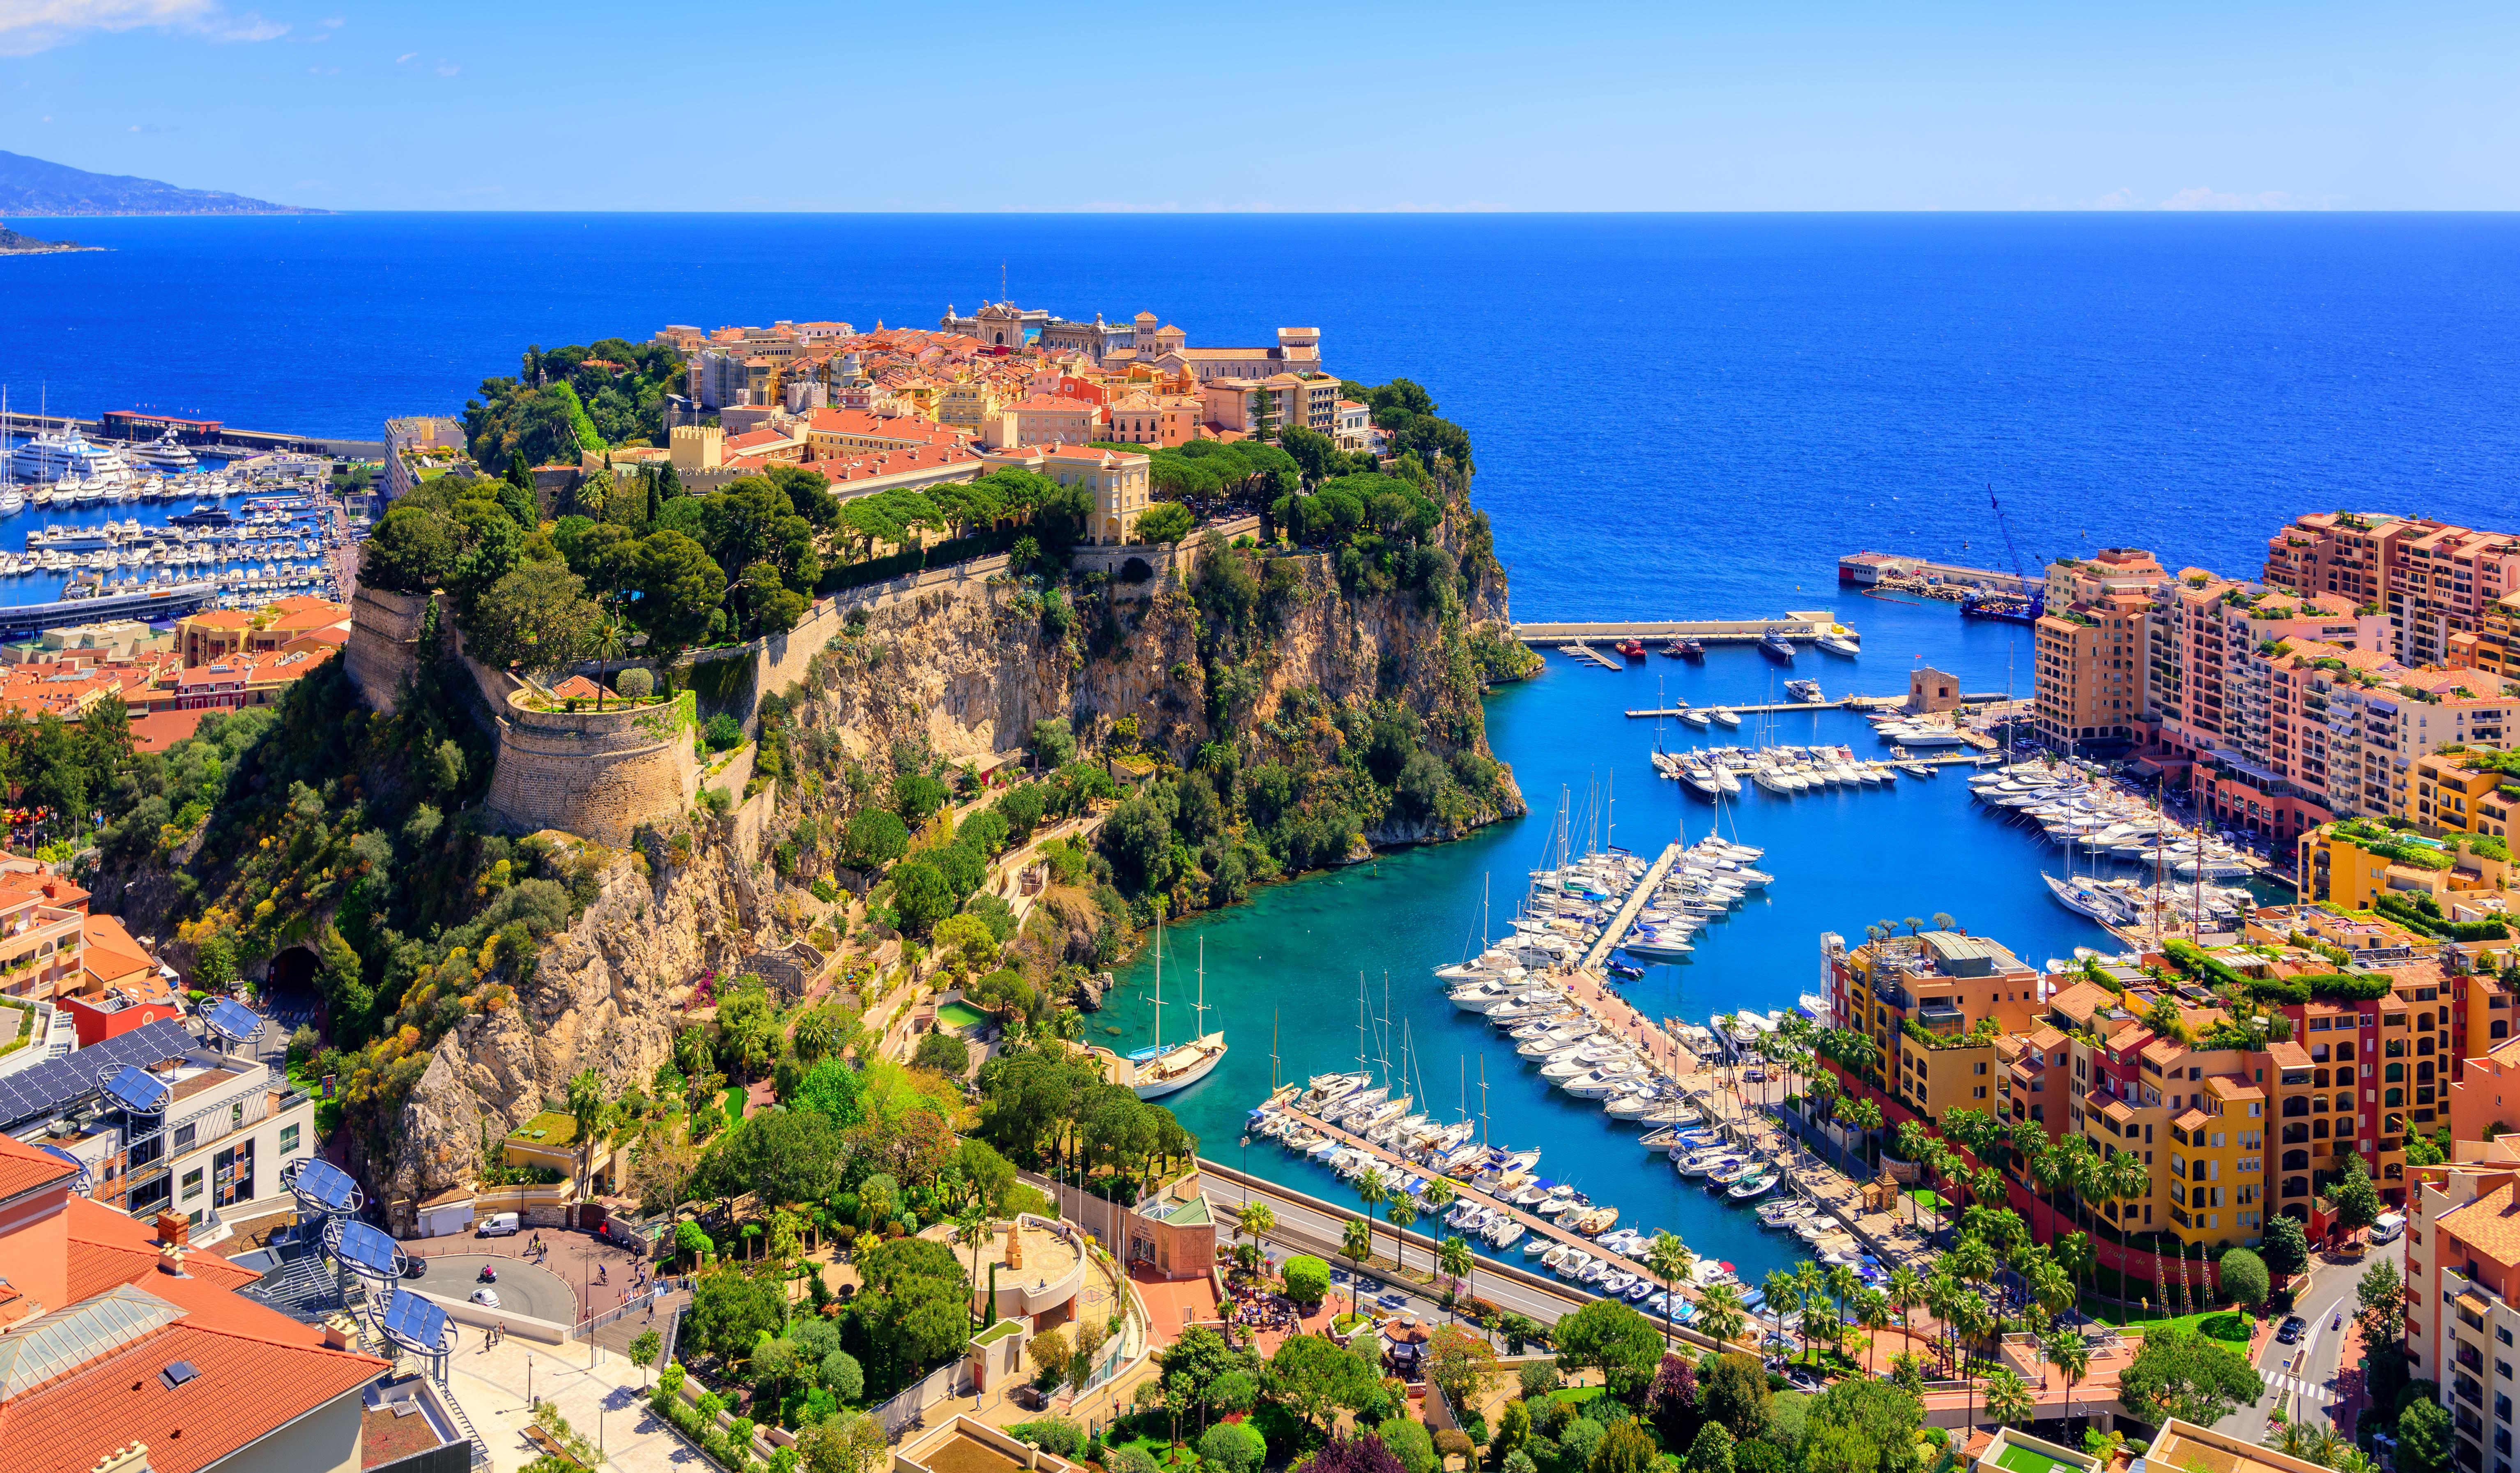 The gems of the Mediterranean